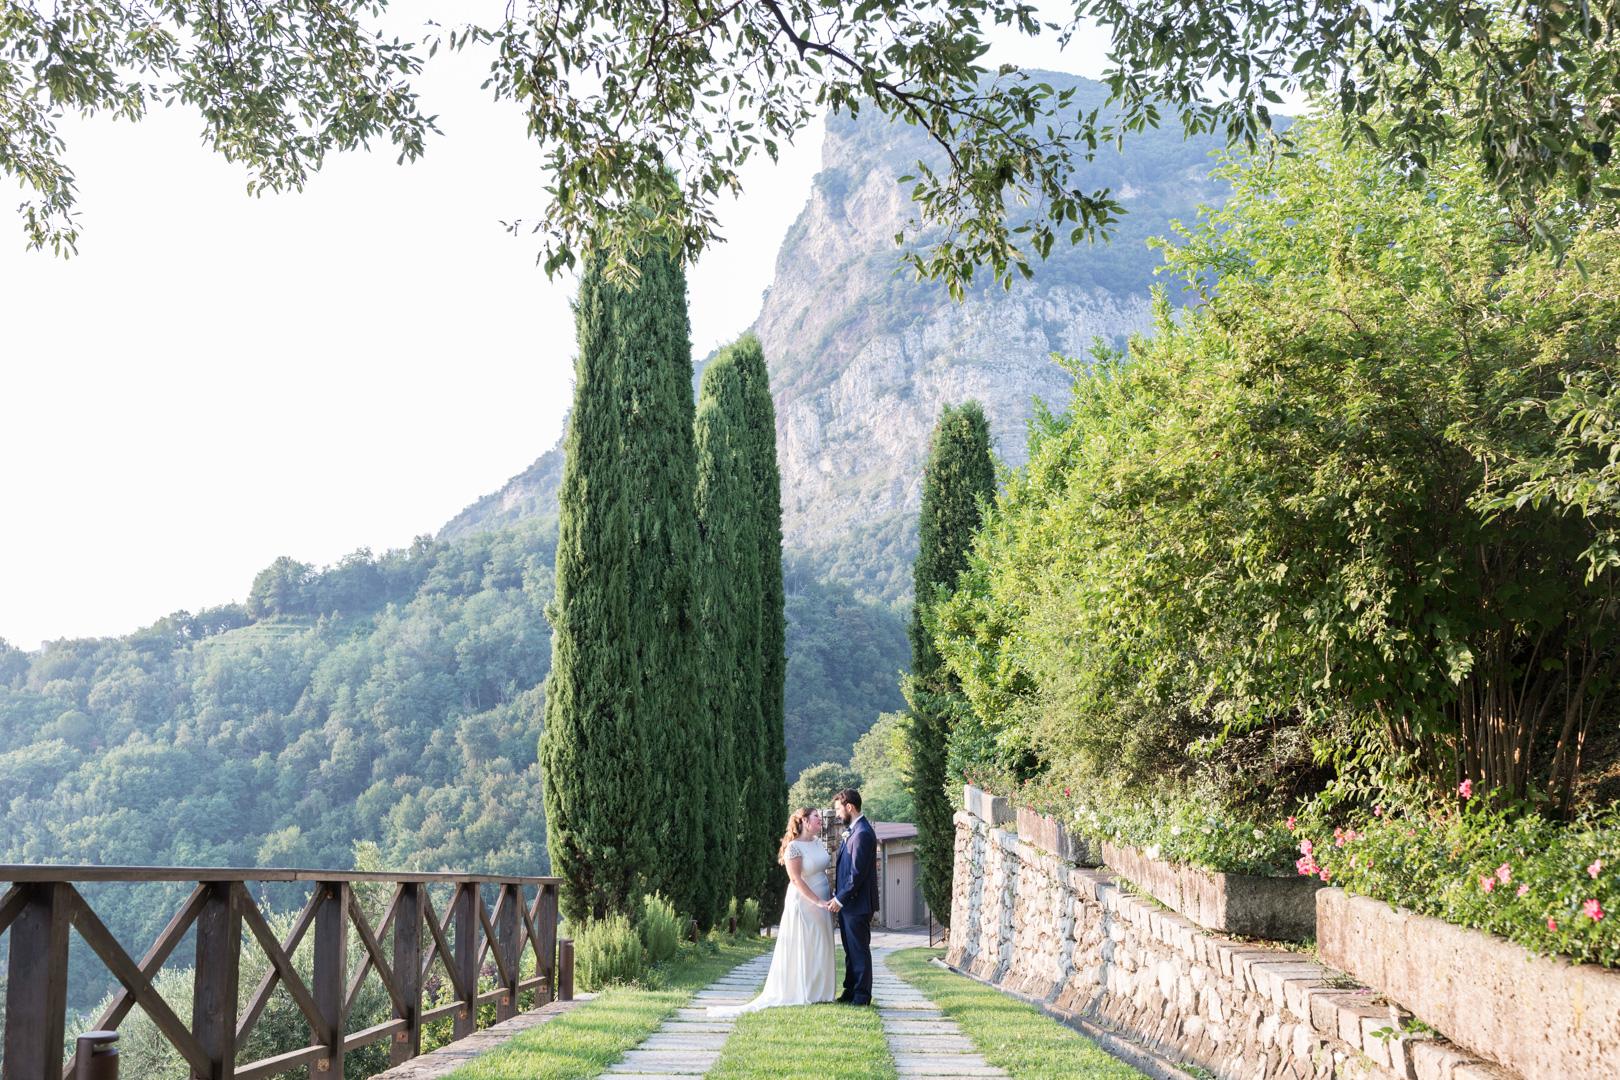 Andreas_Pinacci_Wedding_Photographer-44.